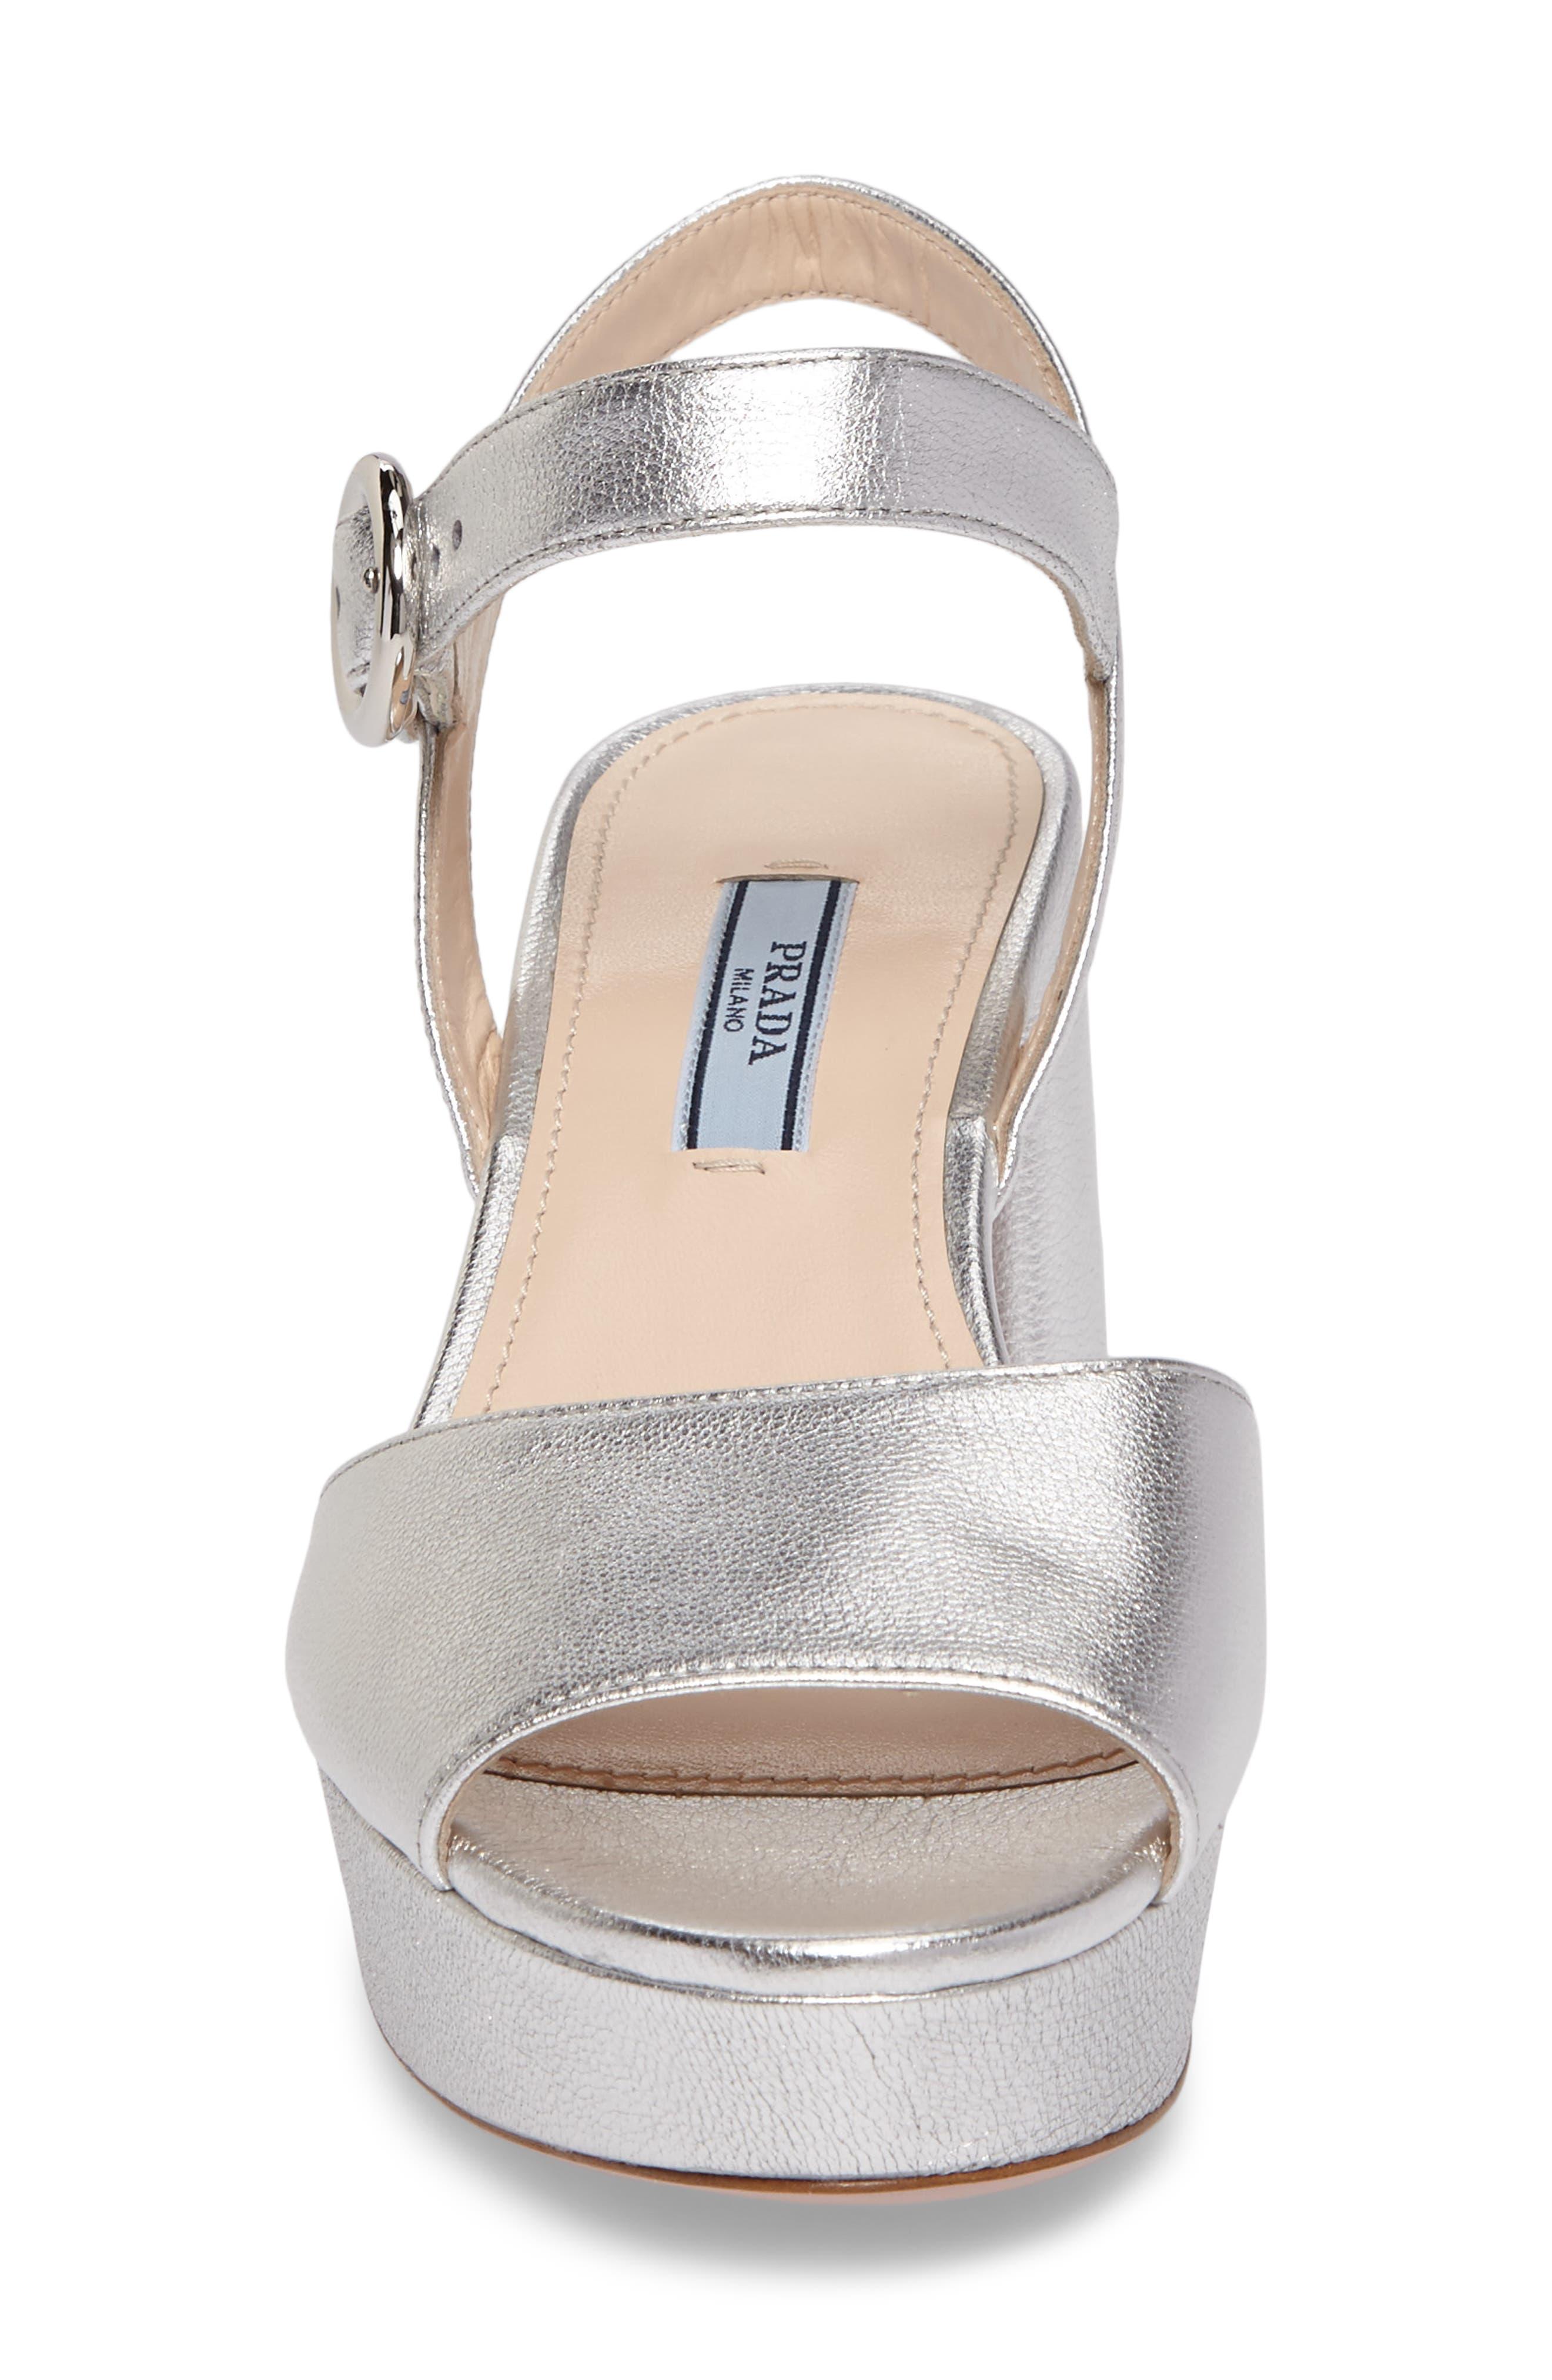 Ankle Strap Platform Sandal,                             Alternate thumbnail 4, color,                             040